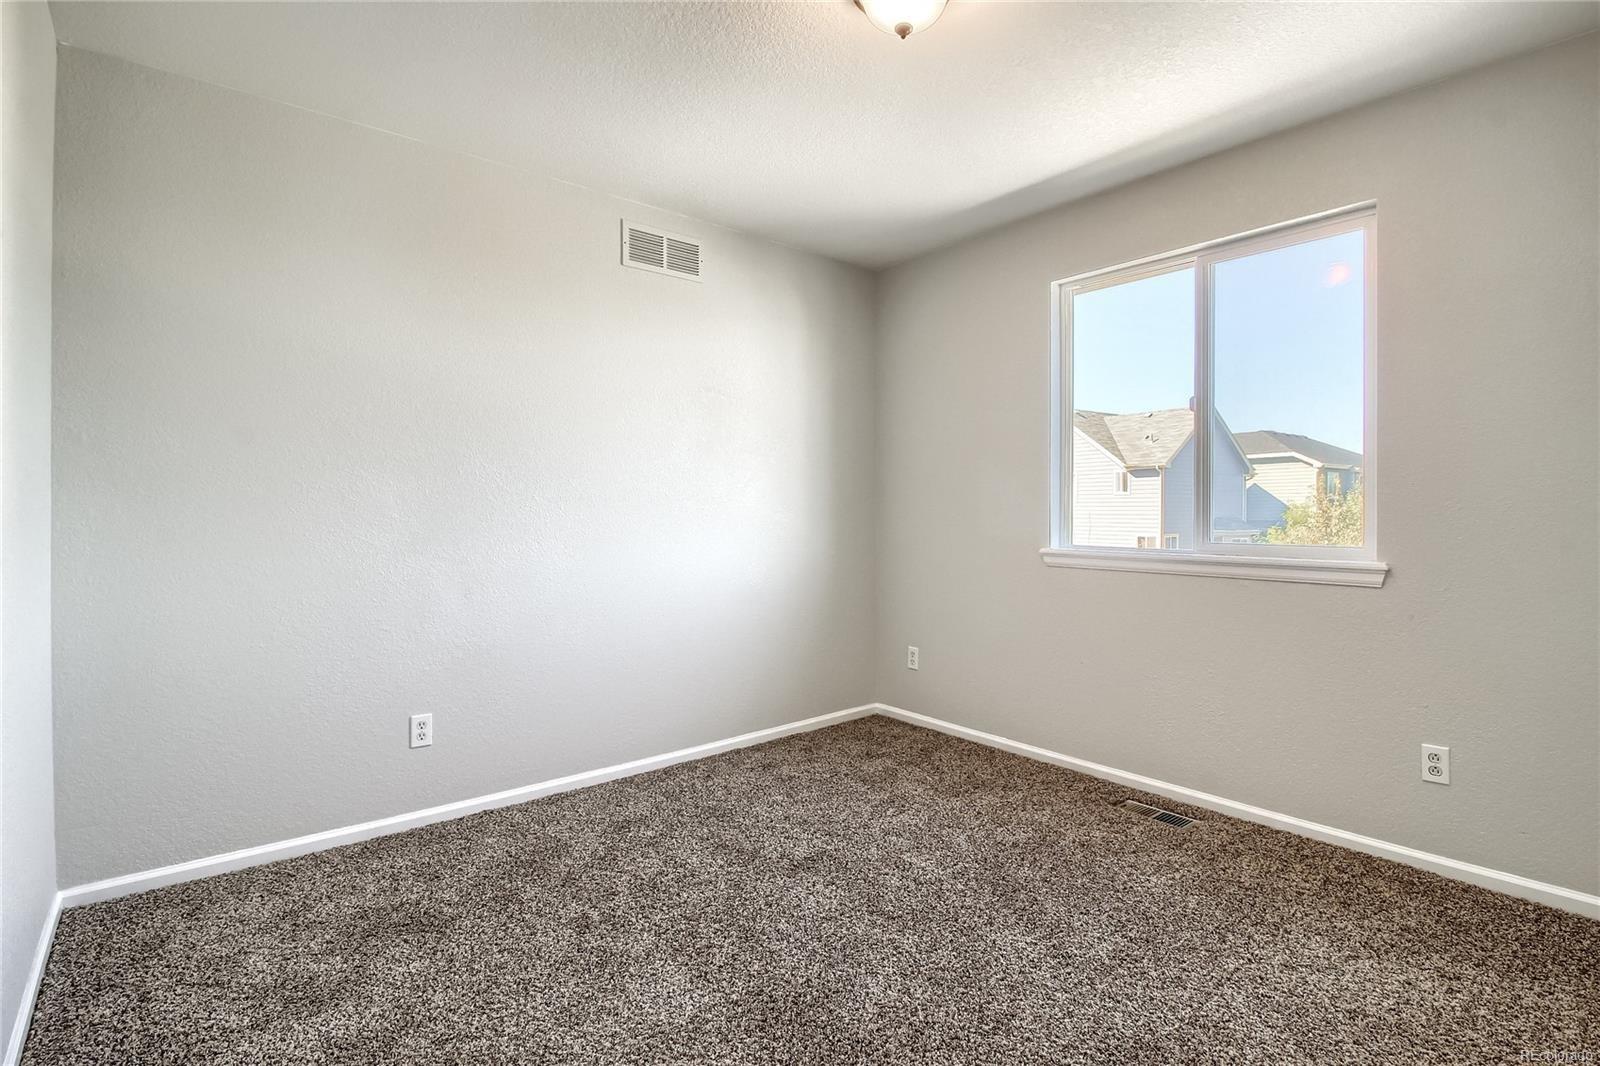 MLS# 9821002 - 1 - 21002  E 40th Place, Denver, CO 80249